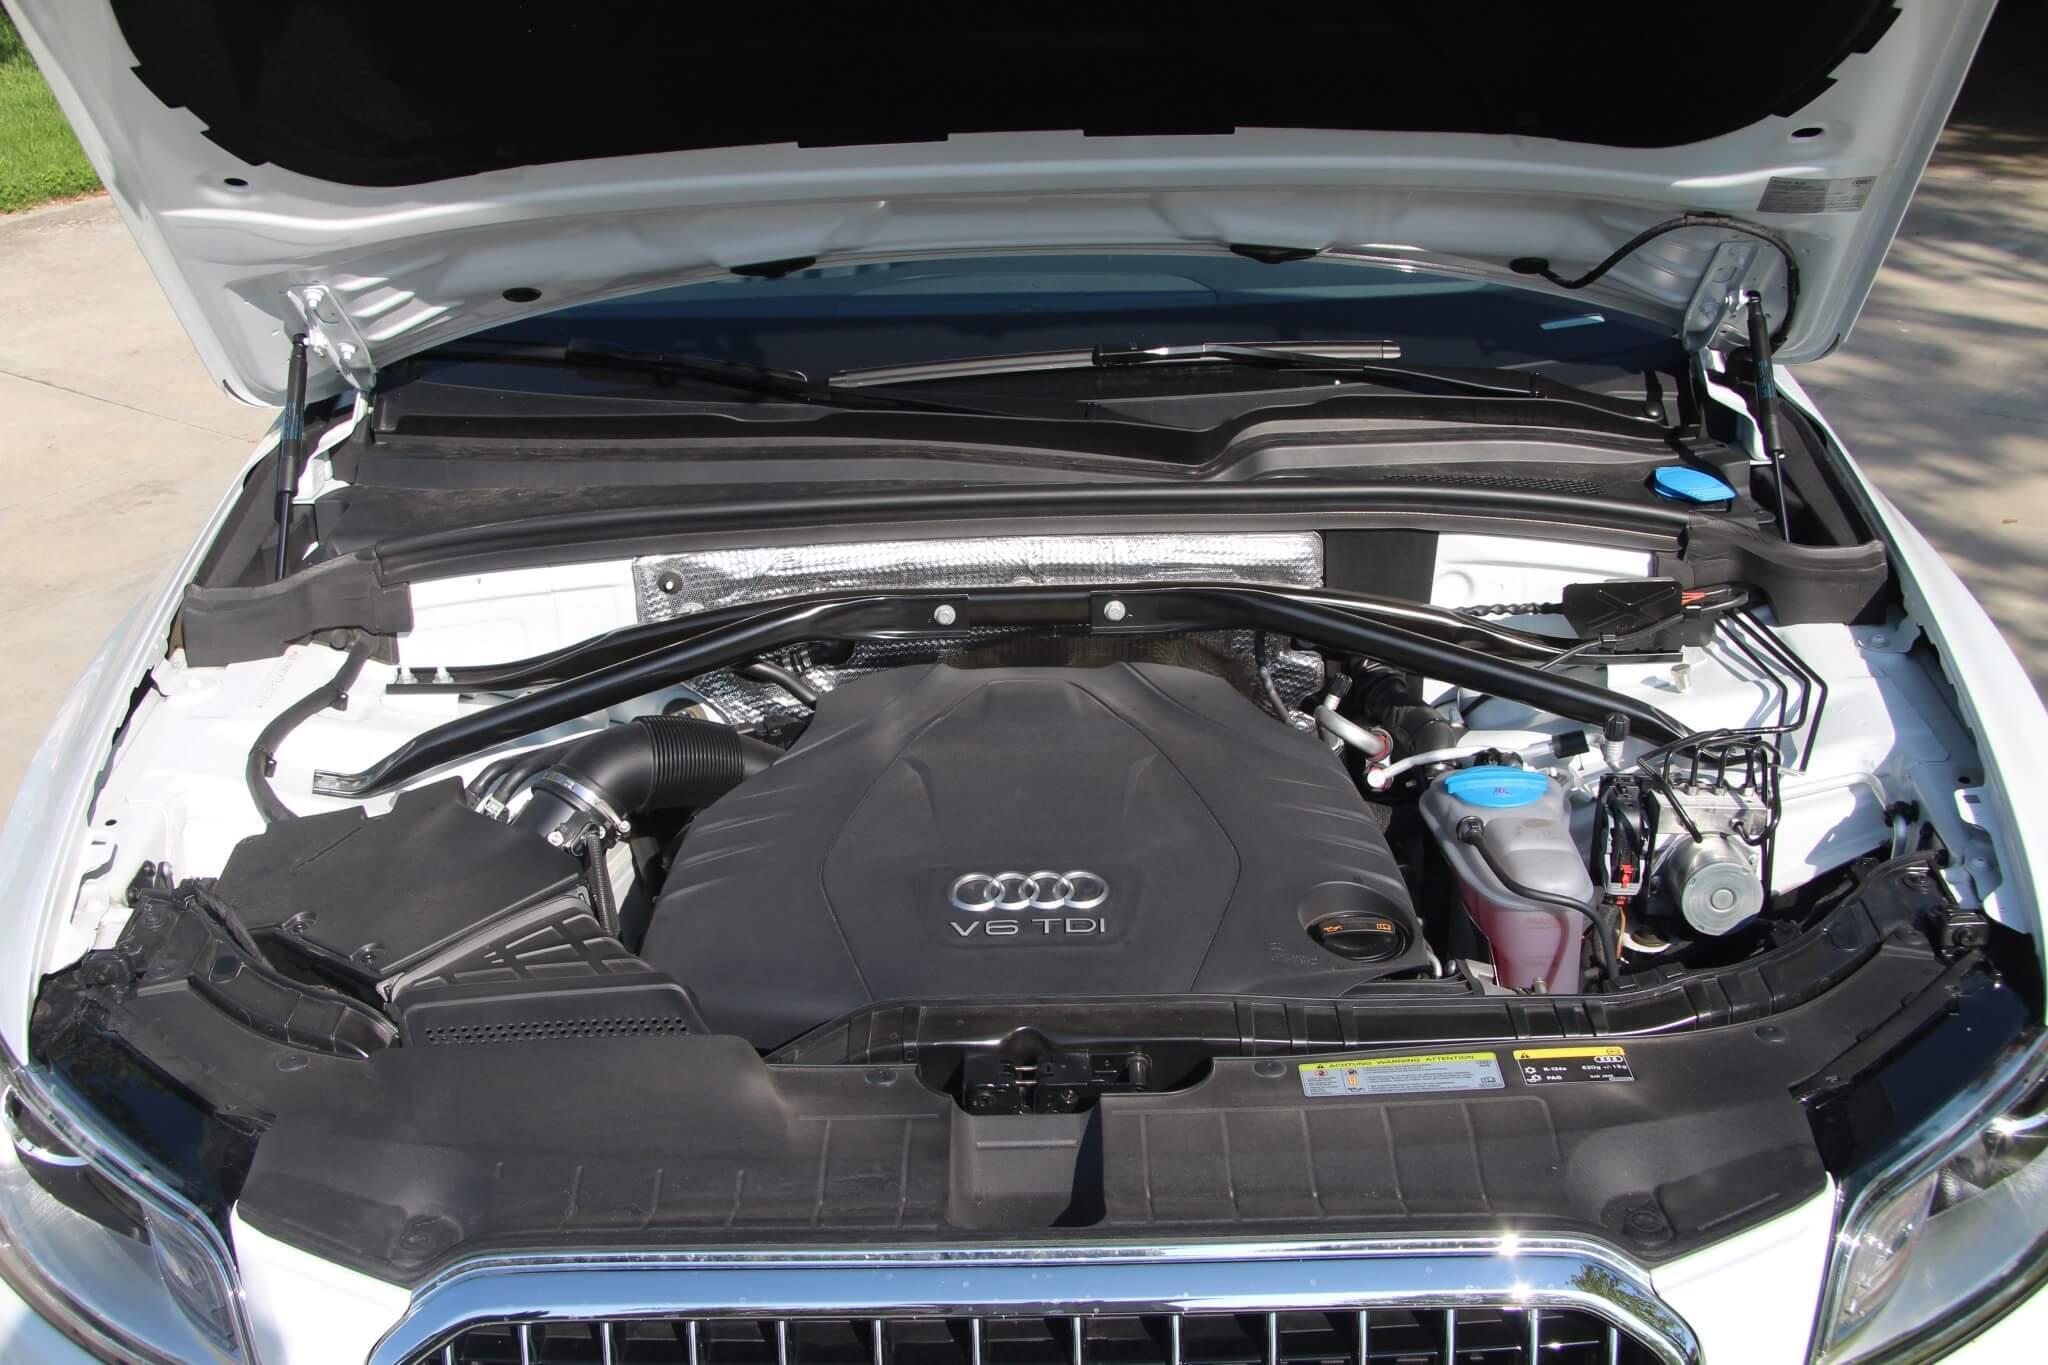 2014 Audi Q5: A Hyper-Mileage Luxury Diesel SUV